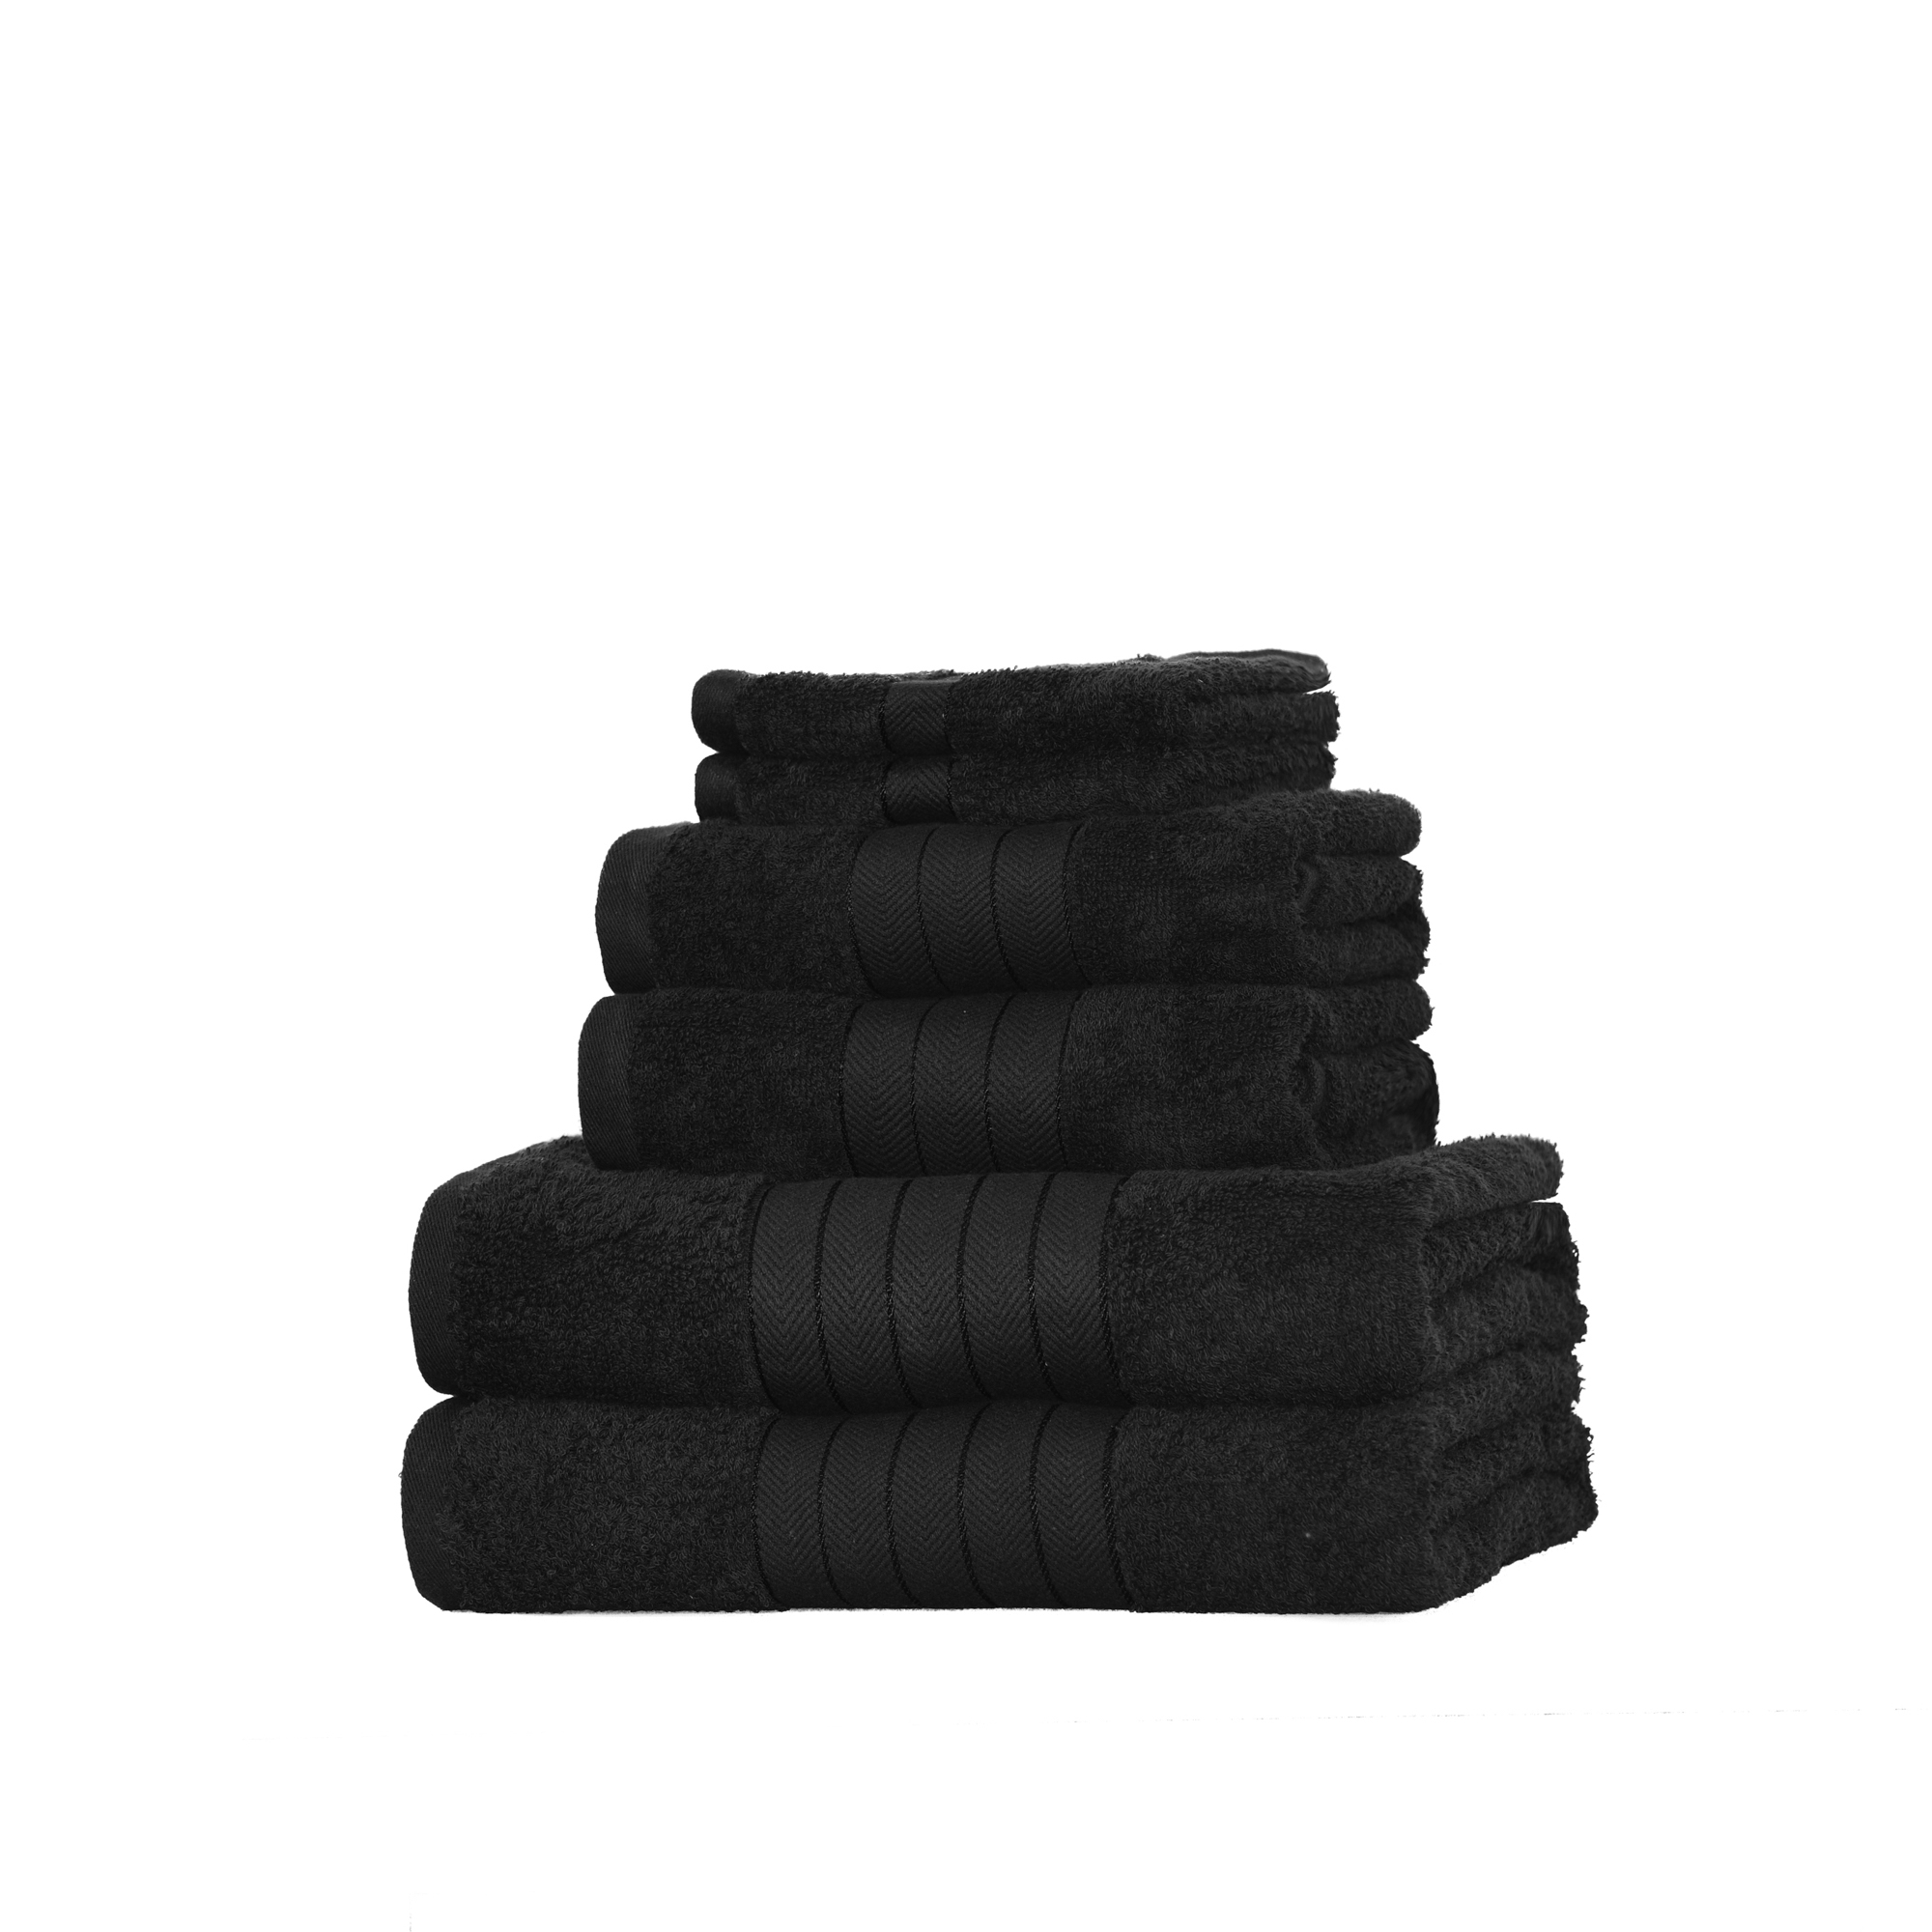 Dreamscene-Luxury-100-Cotton-Face-Hand-Bath-6-Piece-Bathroom-Towel-Bale-Set-NEW thumbnail 49